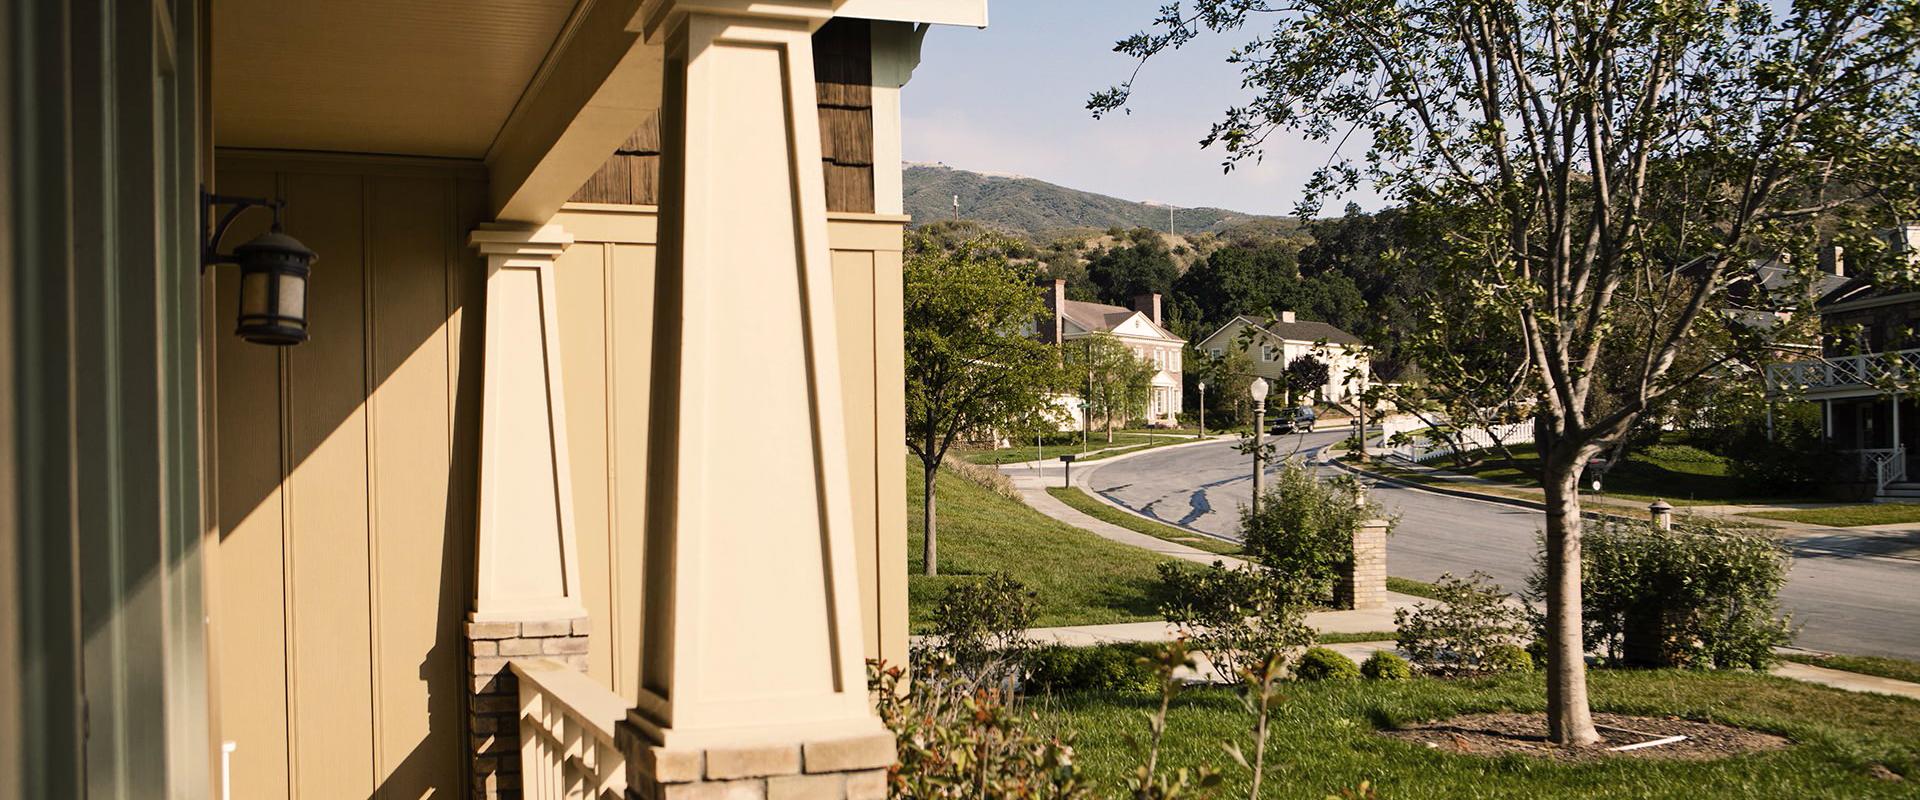 arts-and-crafts-house-porch-pillars_1.jpg